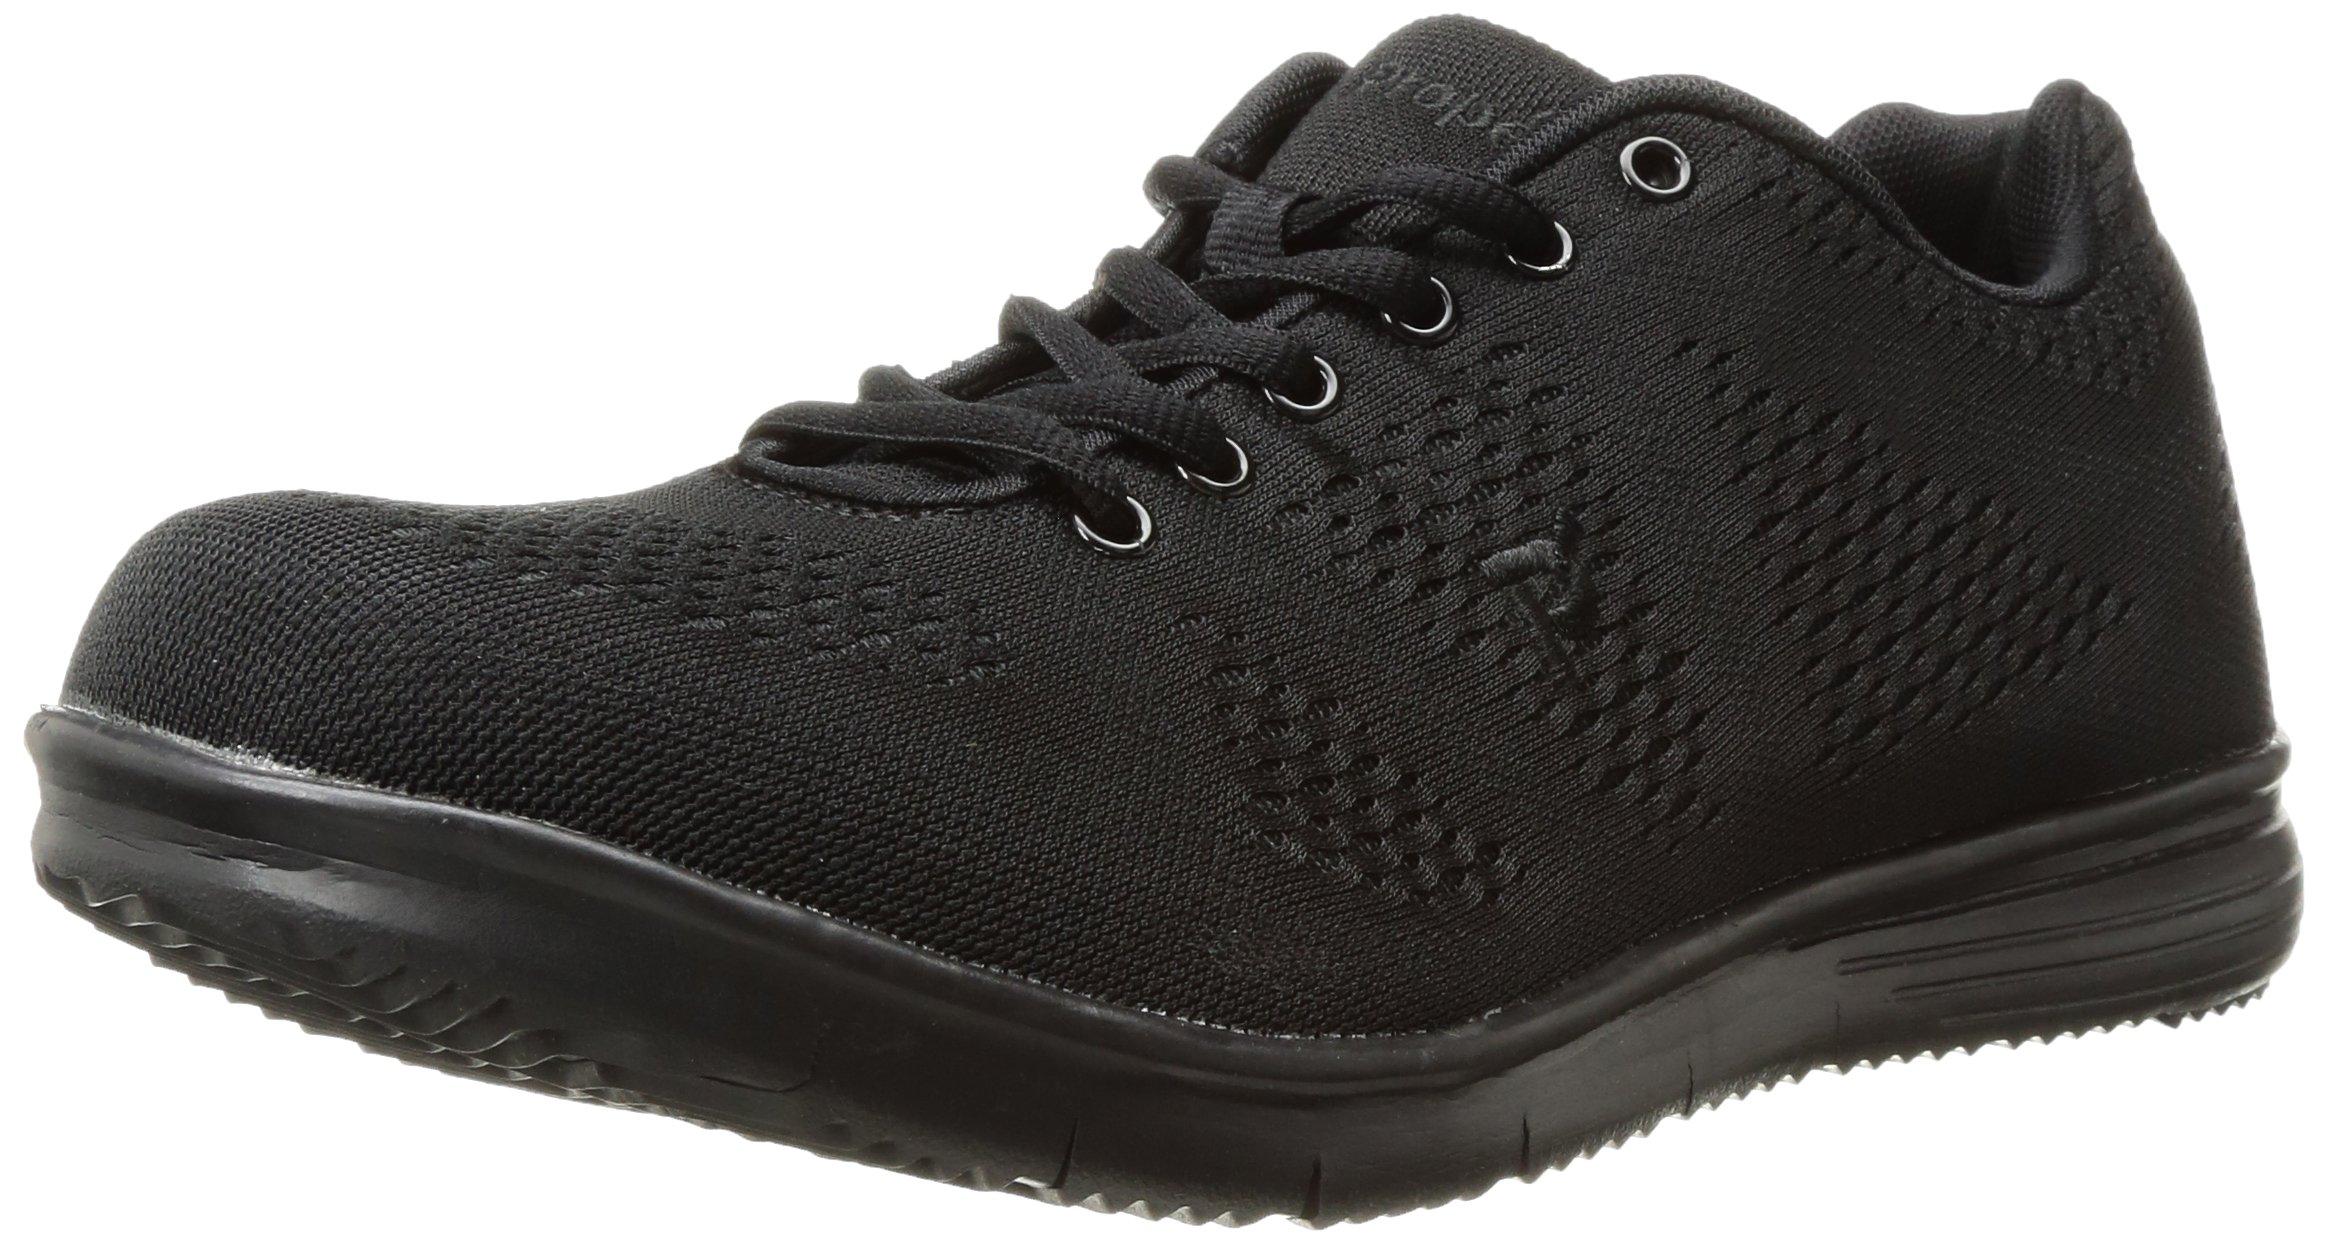 Propet Men's TravelFit Walking Shoe, All Black, 11.5 5E US